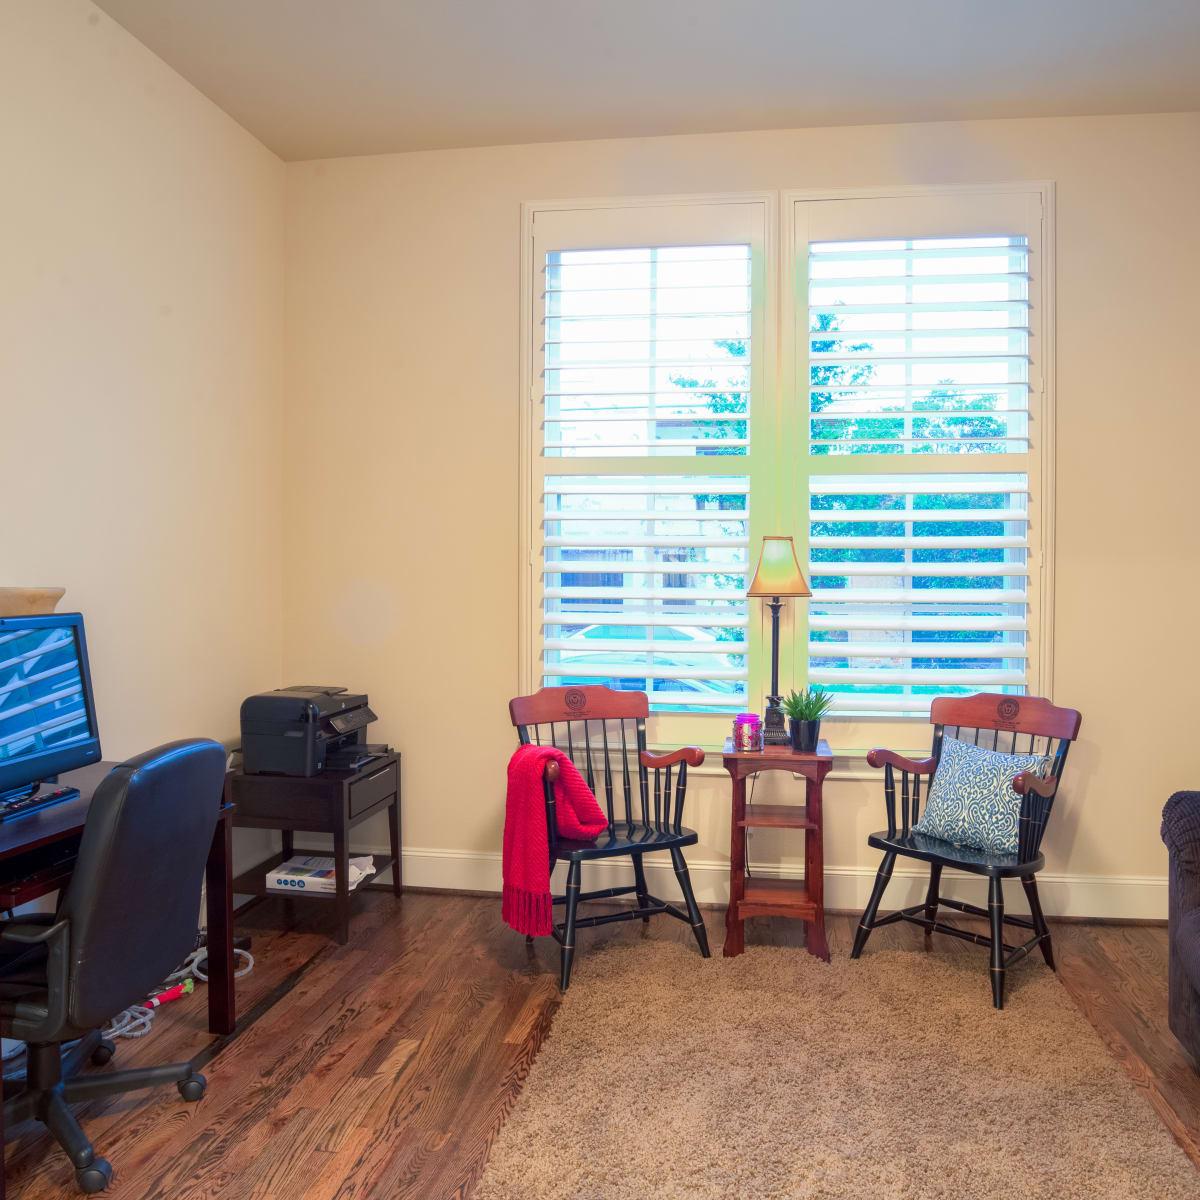 Houston, 1216 Bomar, June 2015, computer room